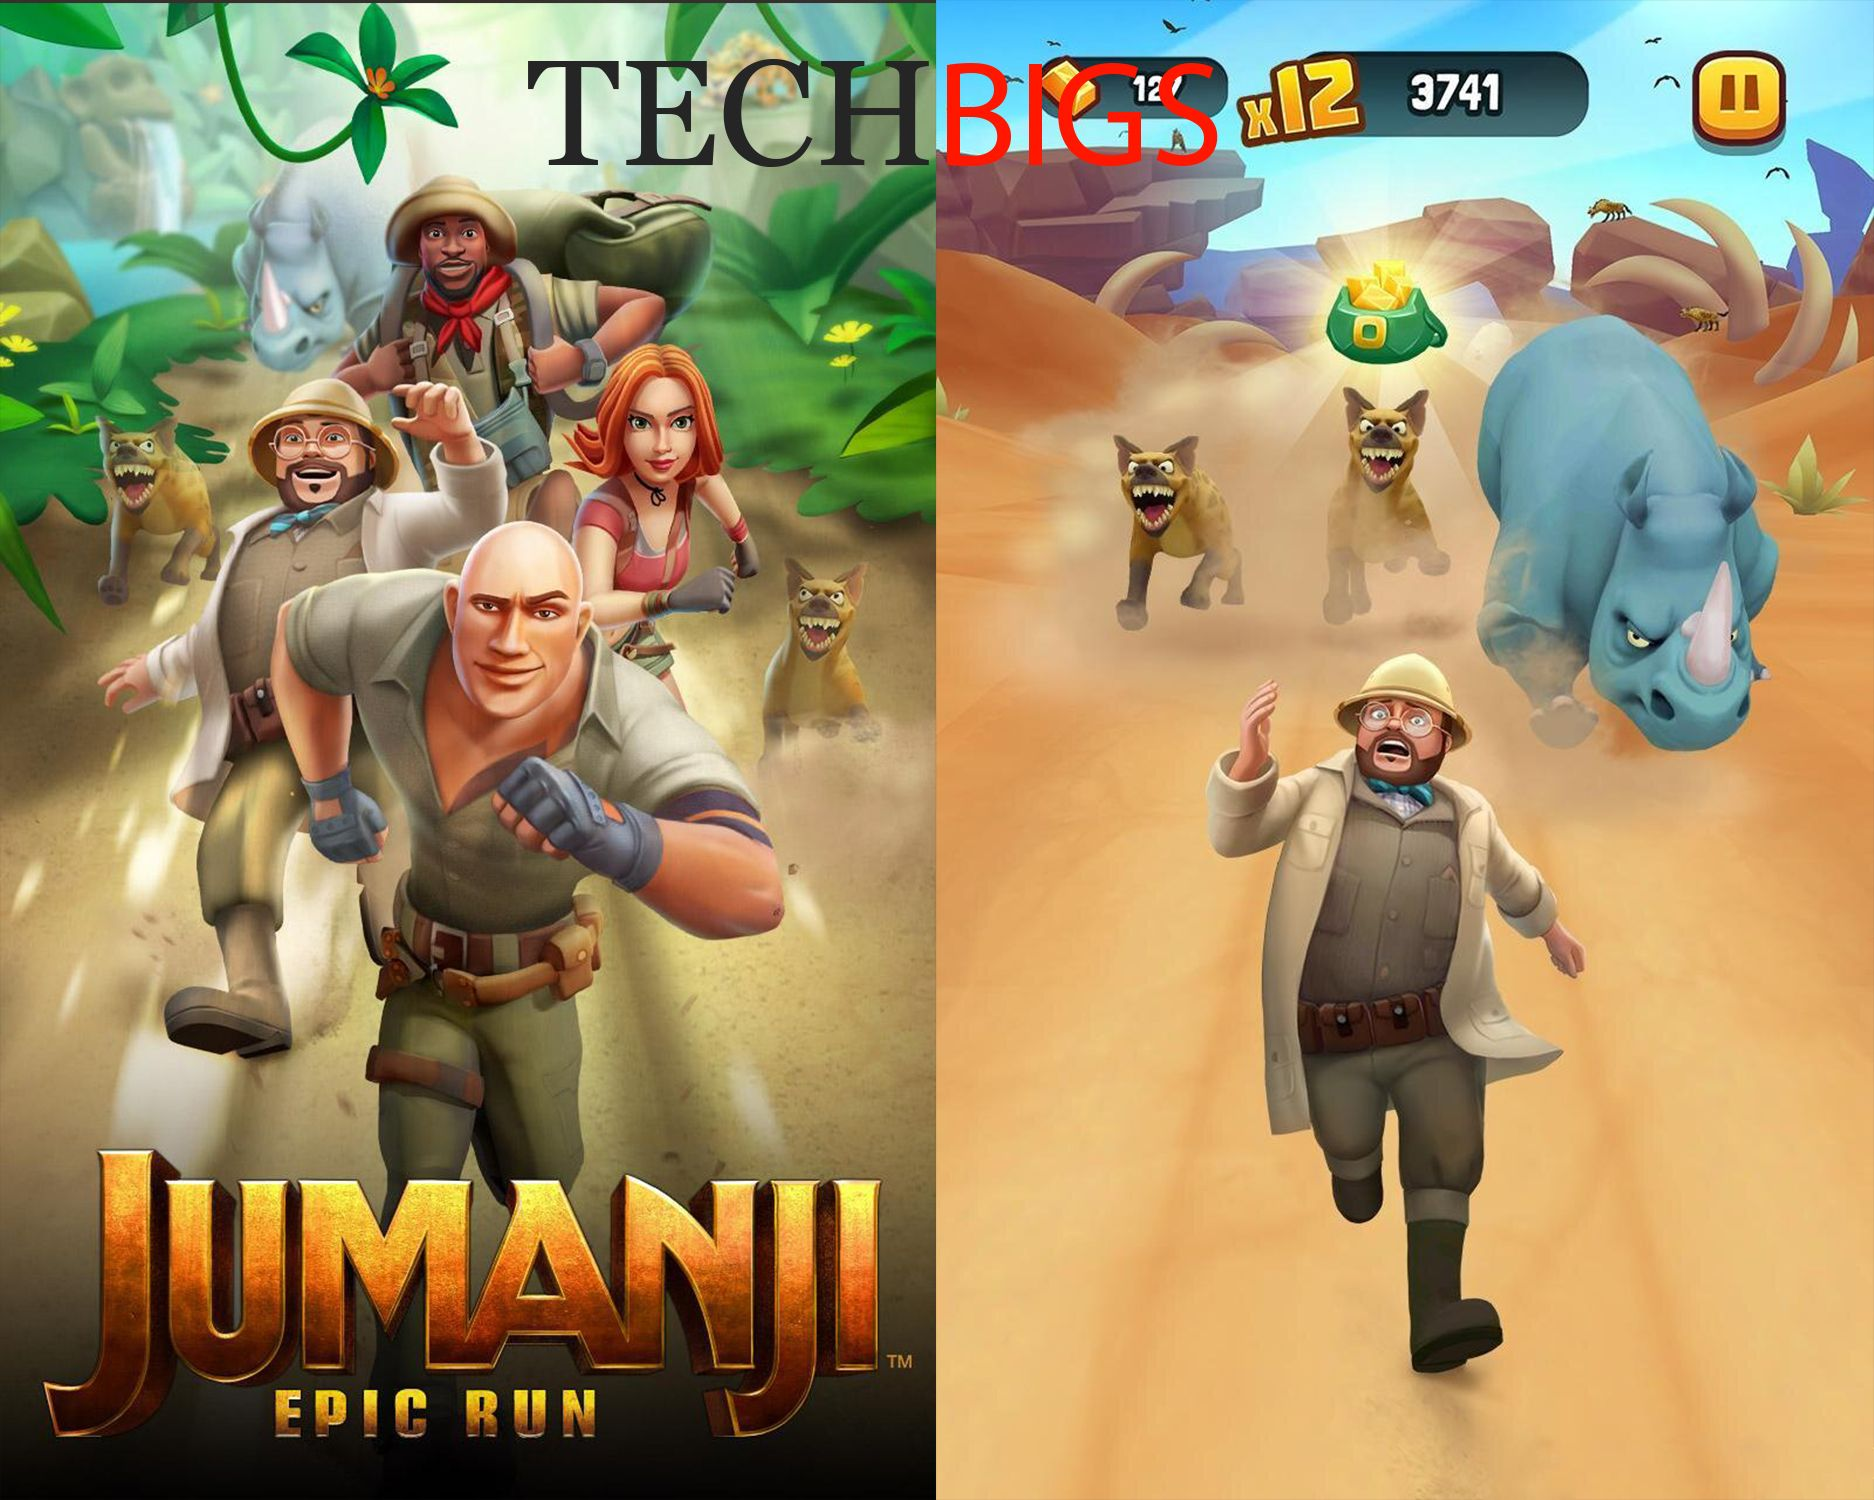 Download Jumanji Epic Run Mod APK for Android Techbigs